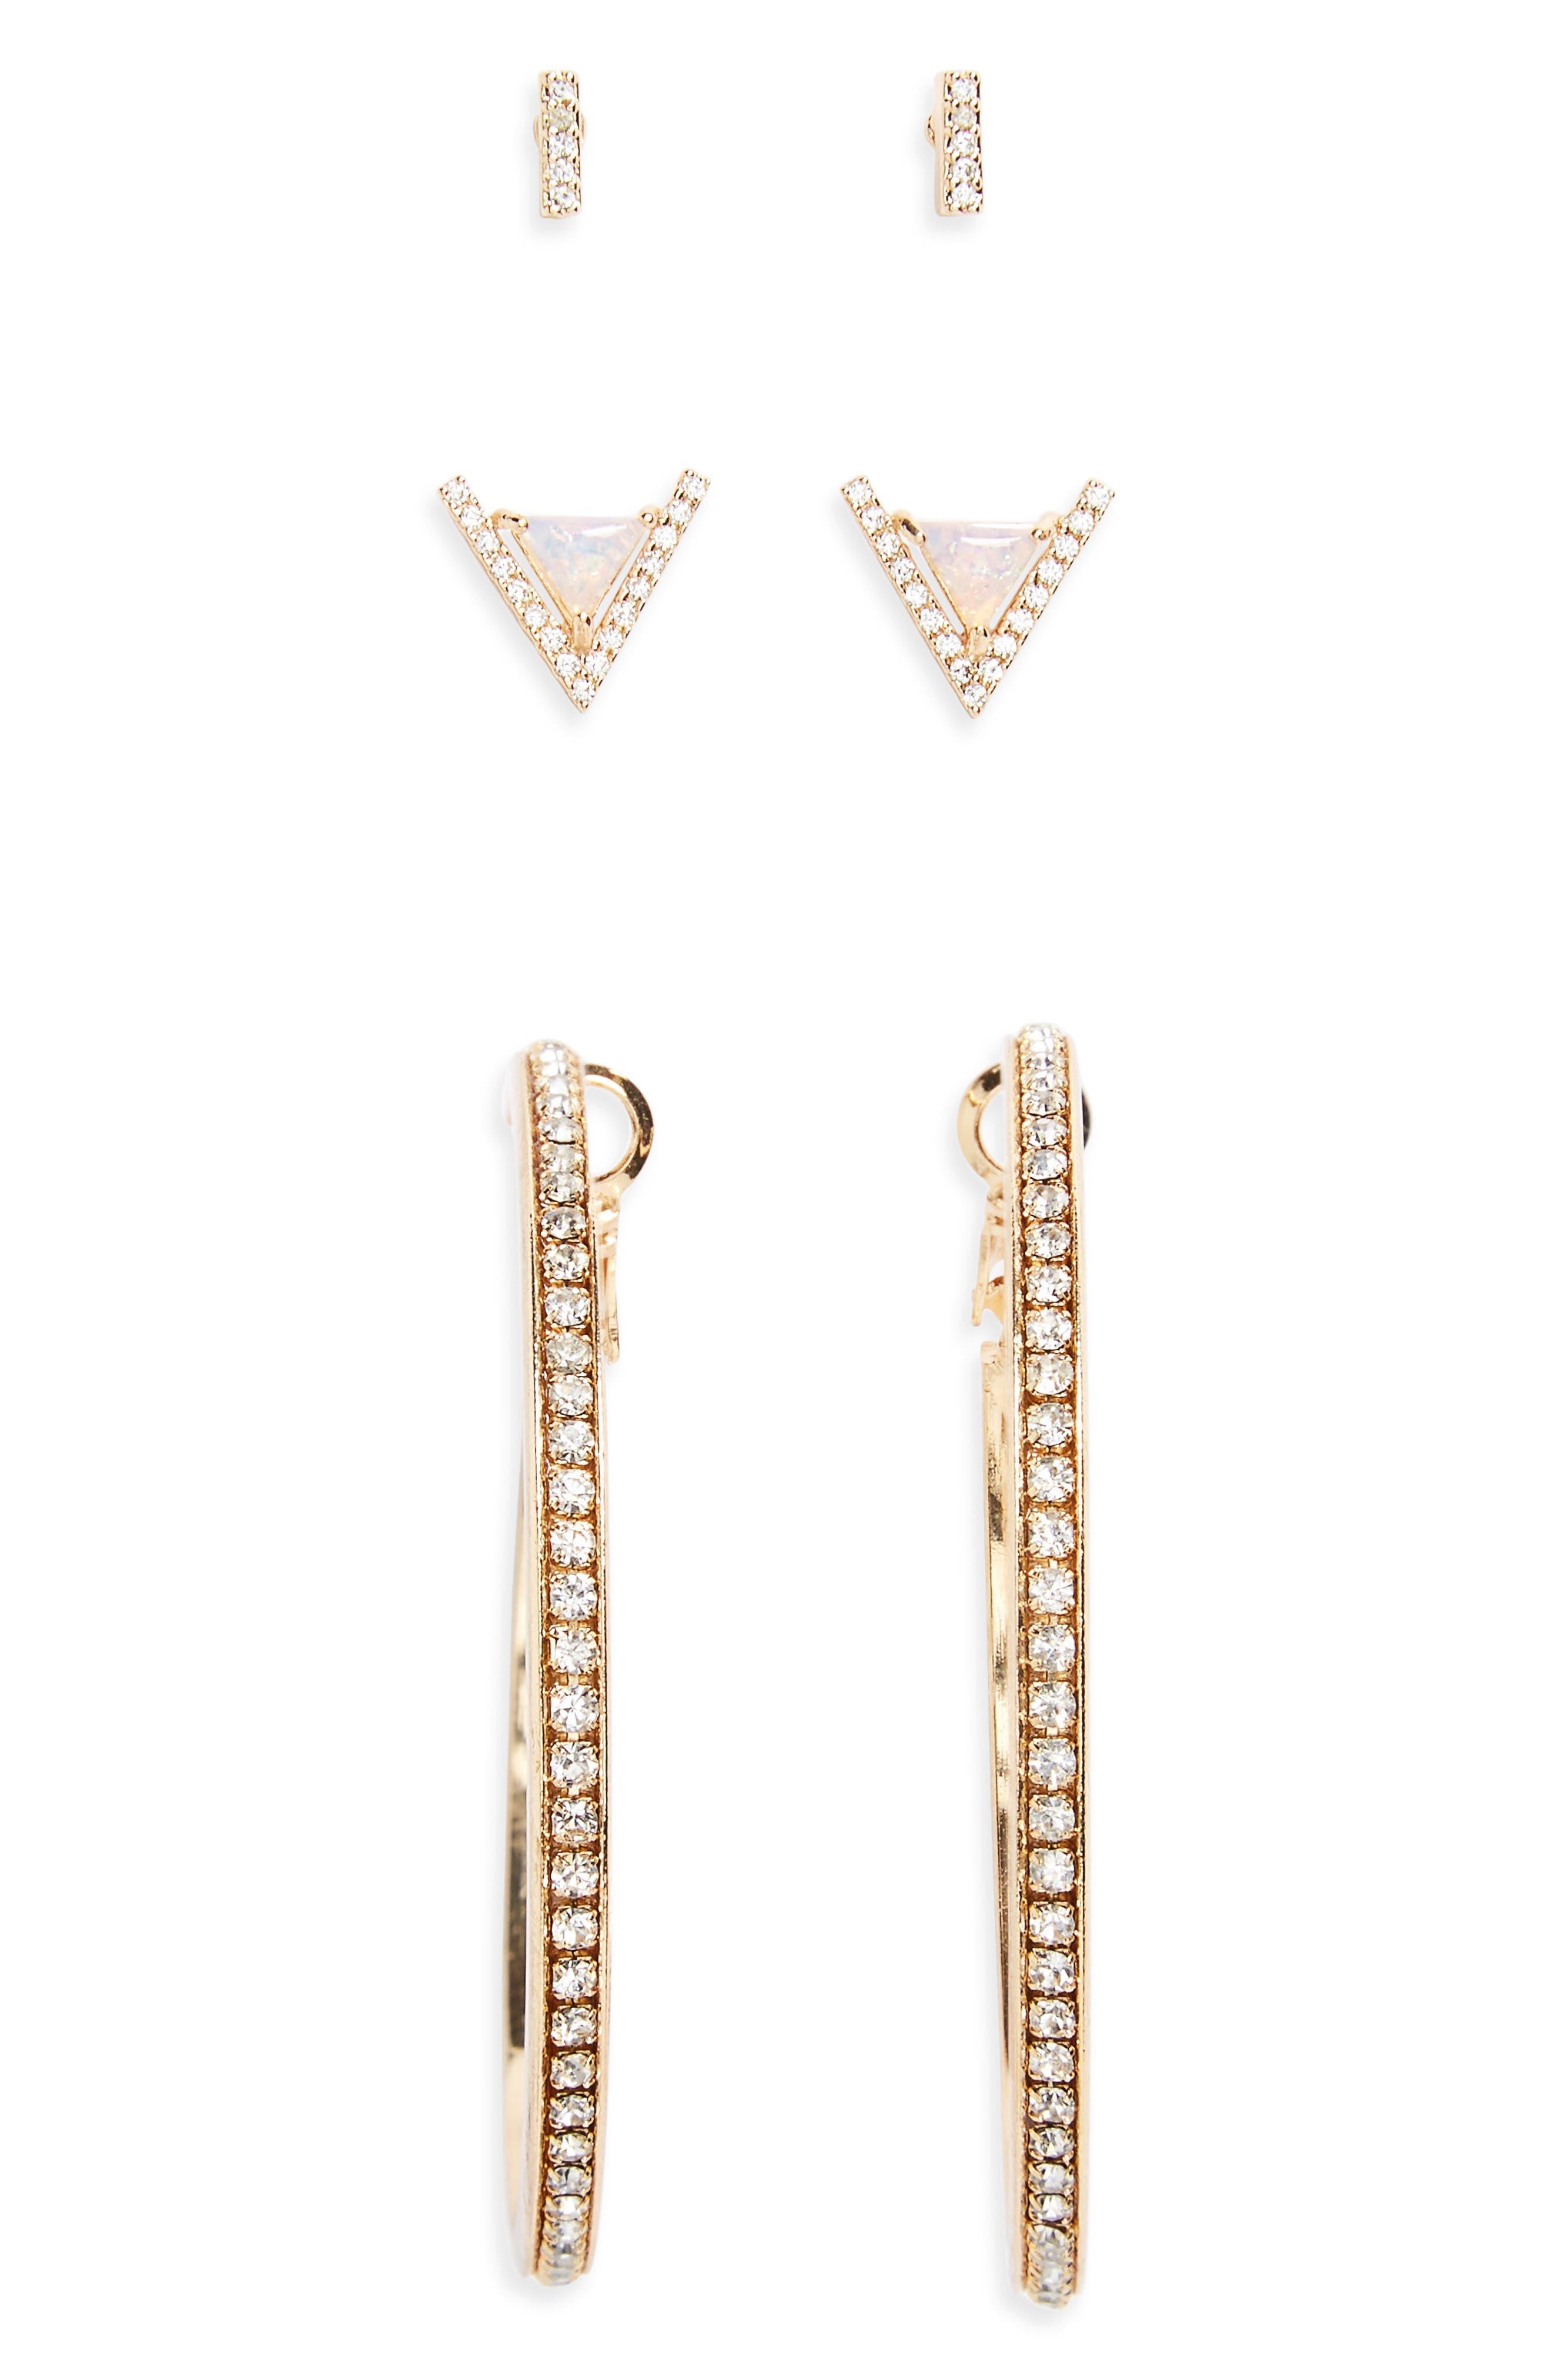 Crystal & Faux Opal 3-Pack Earrings,                             Main thumbnail 1, color,